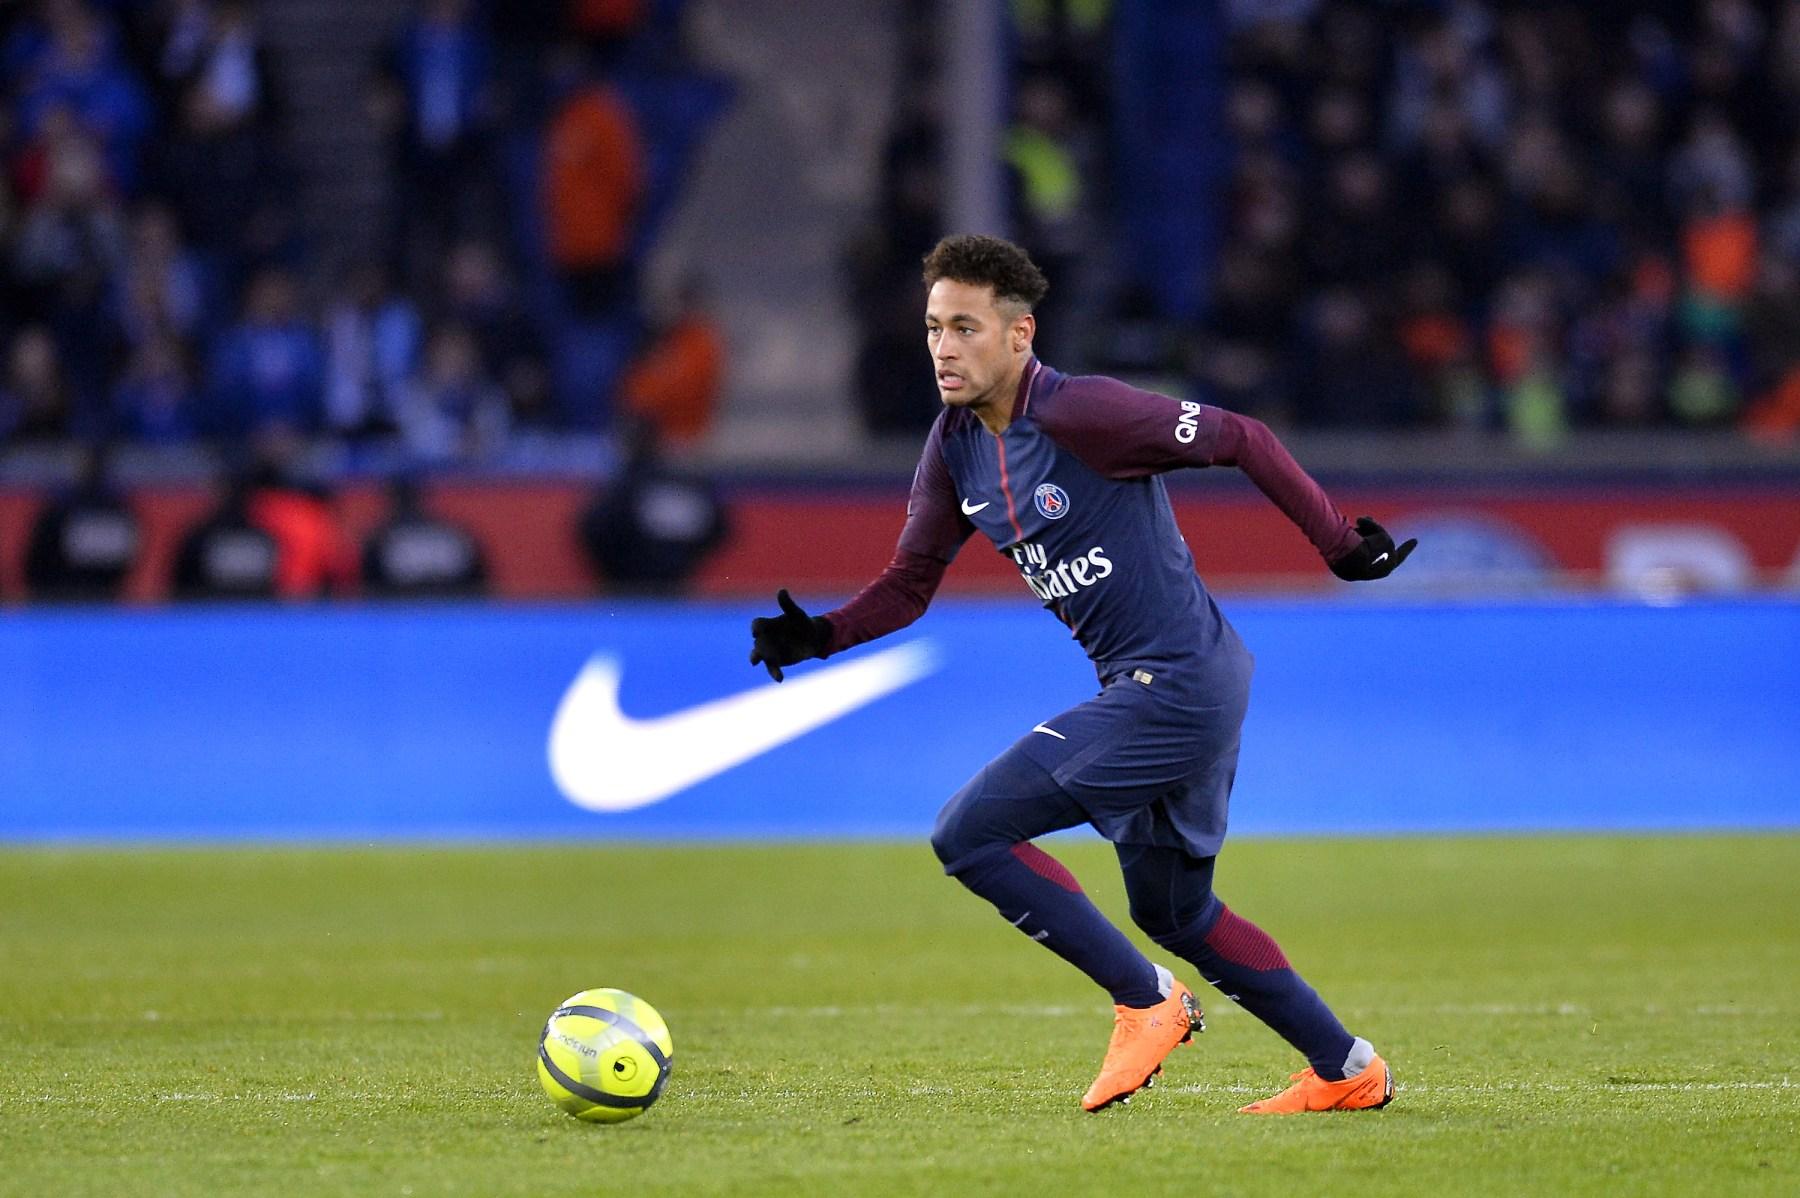 Neymar of Paris Saint-Germain runs with the ball during the Ligue 1 match between Paris saint-Germain and Strasbourg at Parc des Princes on February 17, 2018 in Paris, France.  (Aurelien Meunier/Getty Images)